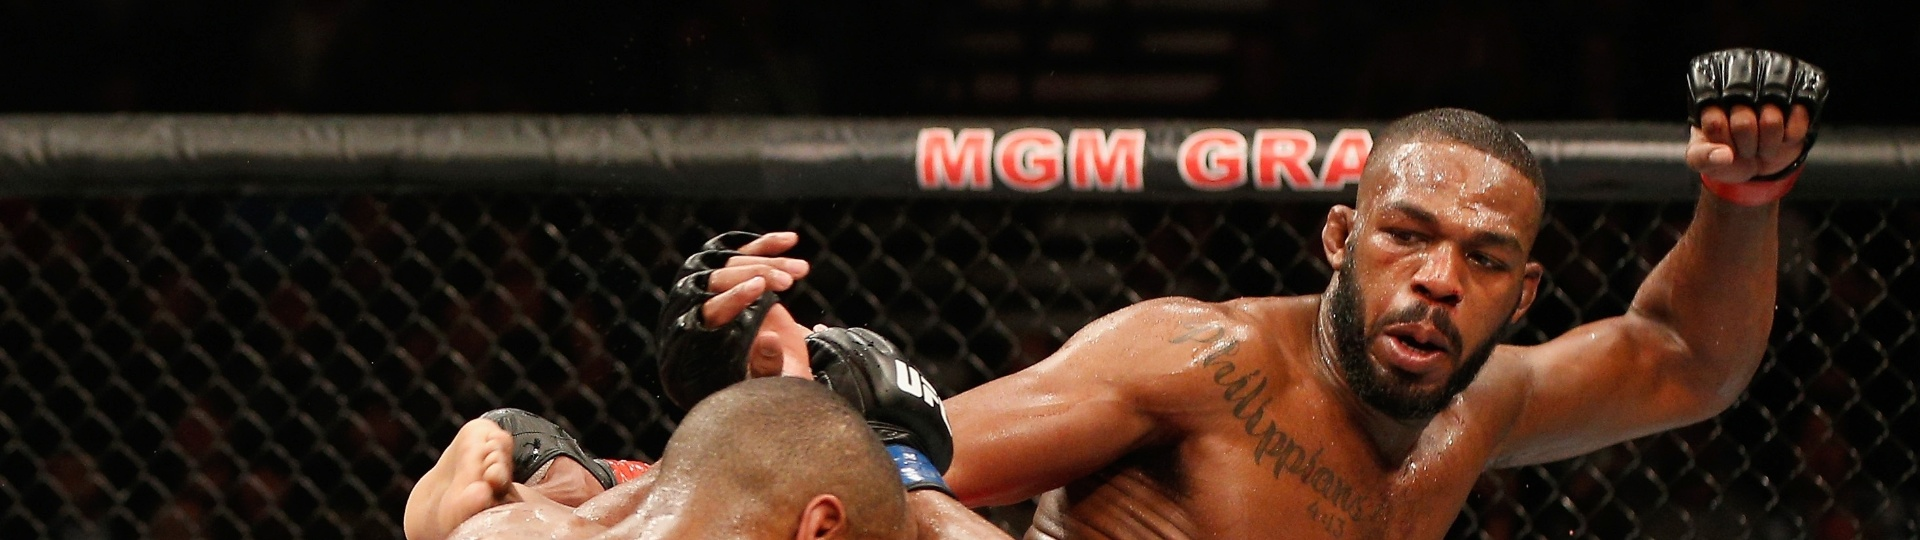 Jon Jones acerta chute na cabeça de Daniel Cormier em luta do UFC 182